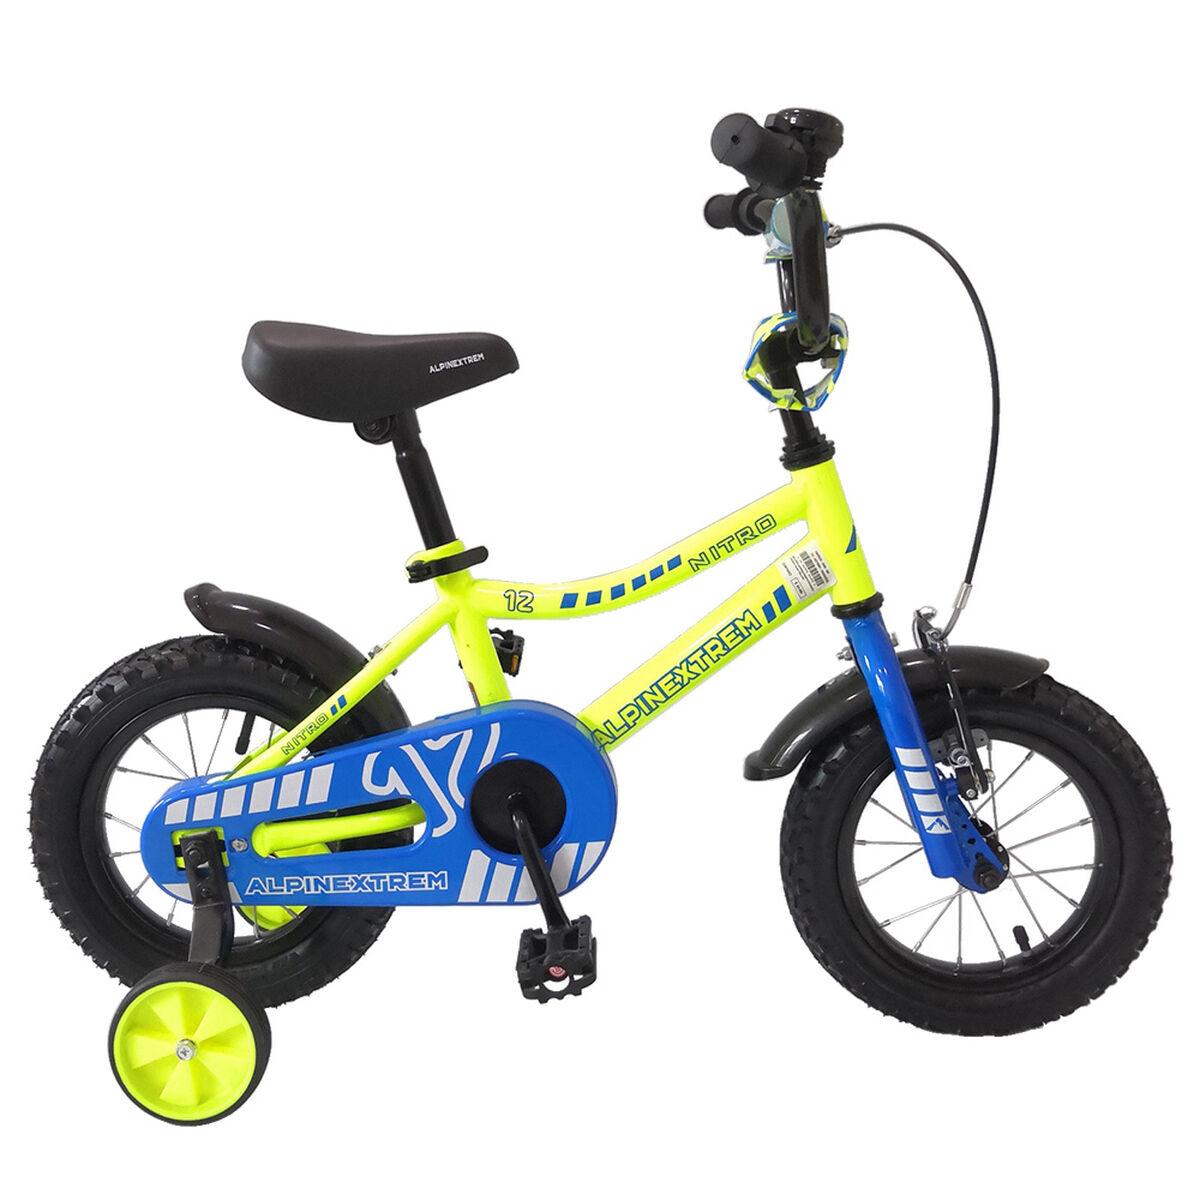 Bicicleta Alpinextrem Niño Fixxes I Aro 12